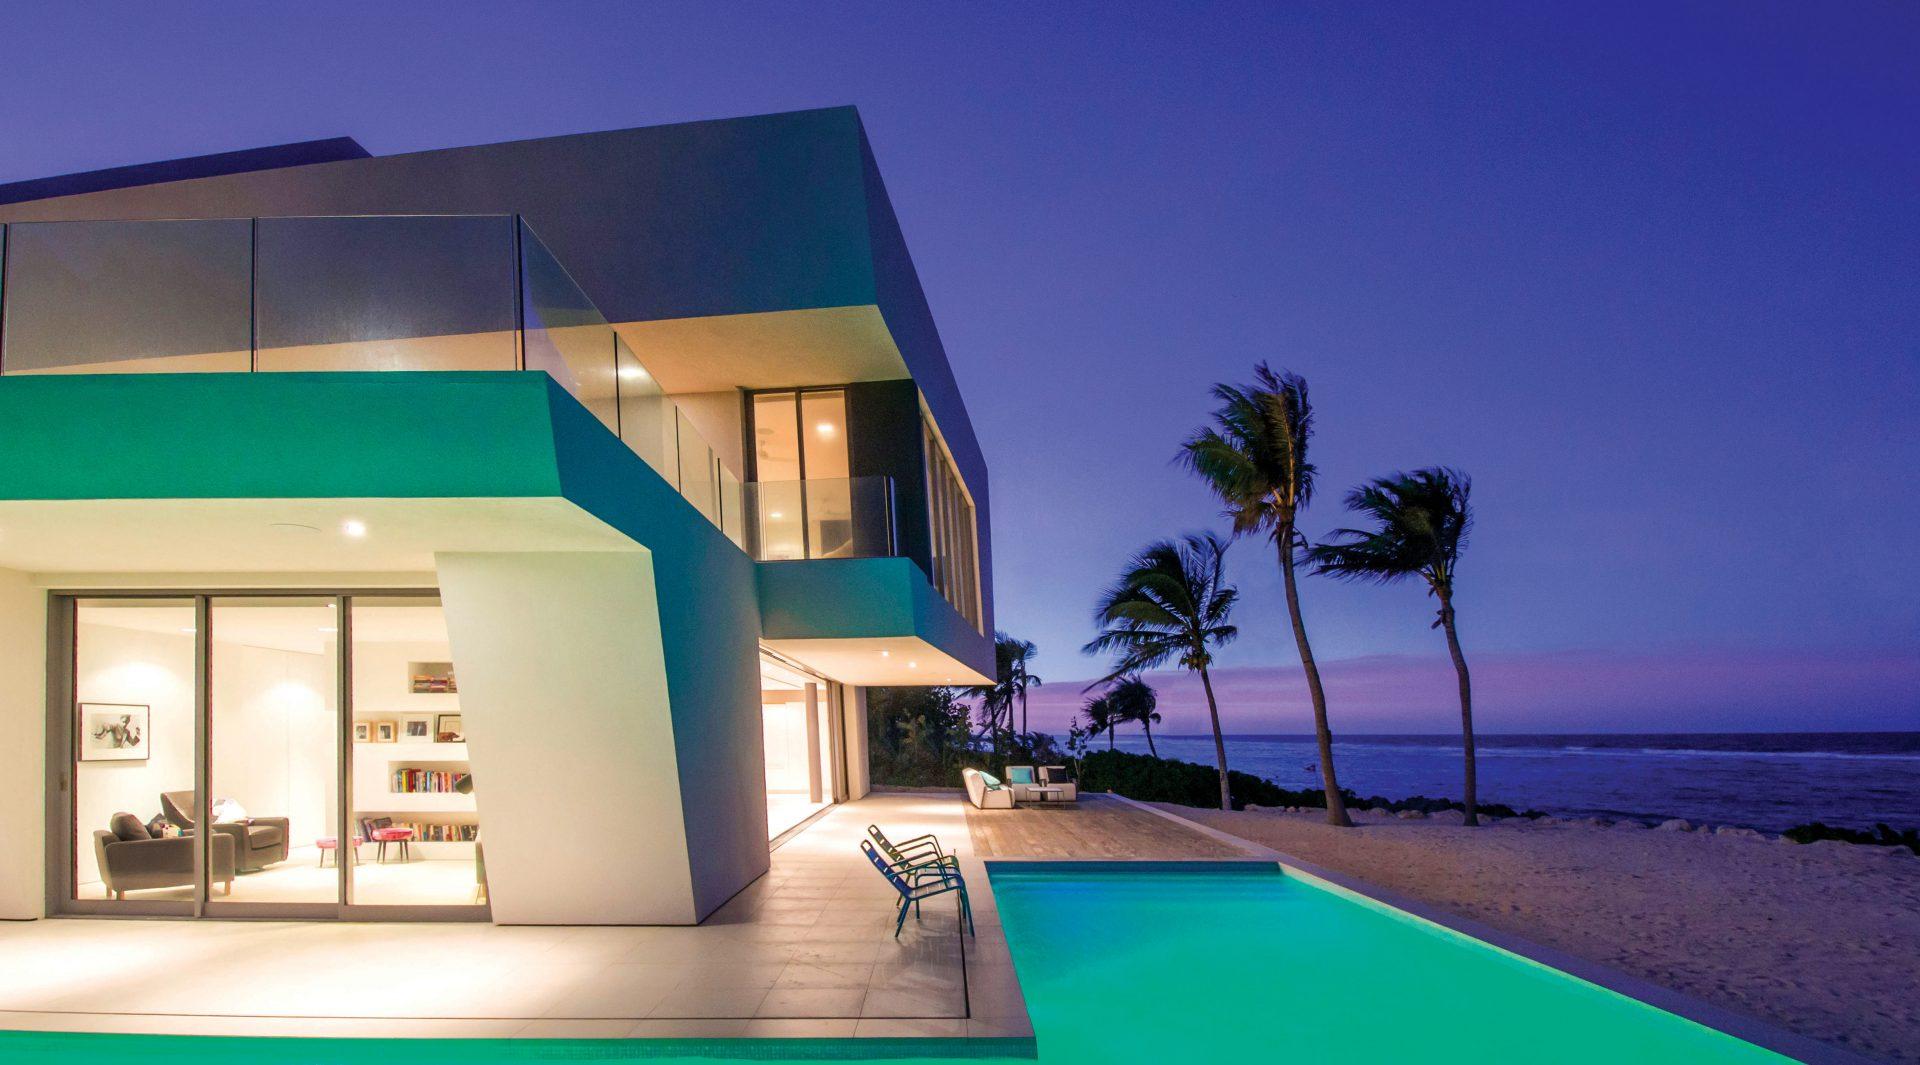 Nicolas Tye Architects